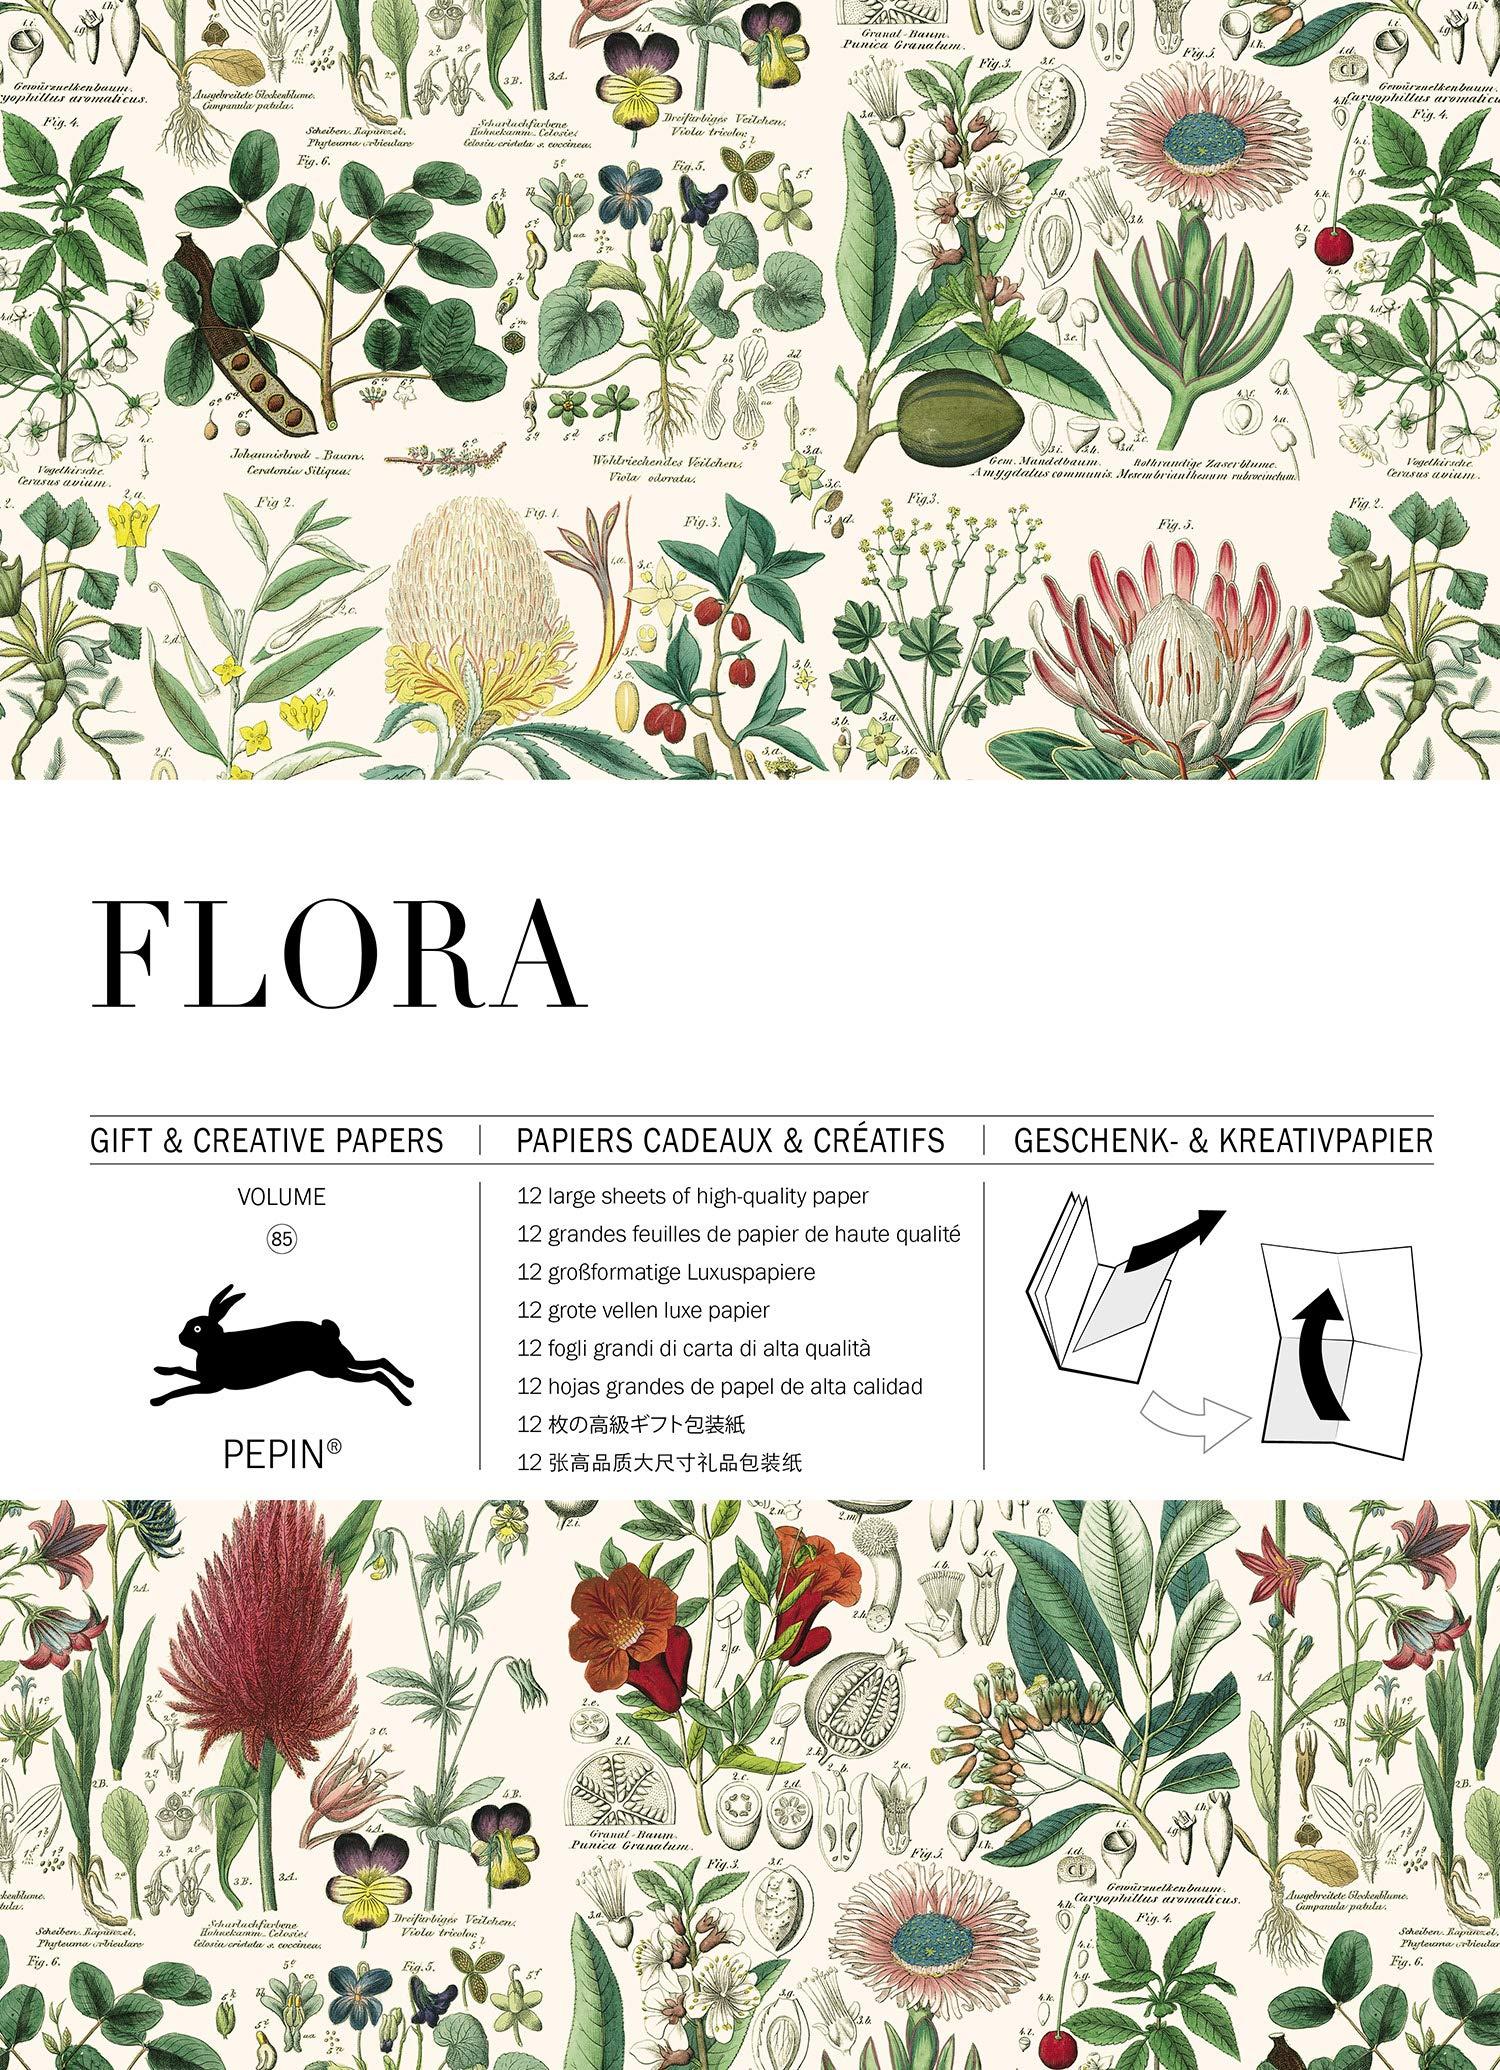 Flora: Gift & Creative Paper Book Vol. 85 (Gift & creative papers (85)) (Inglés) Tapa blanda – 1 ago 2018 Pepin Van Roojen Pepin Press B.V. 9460090974 Handicrafts